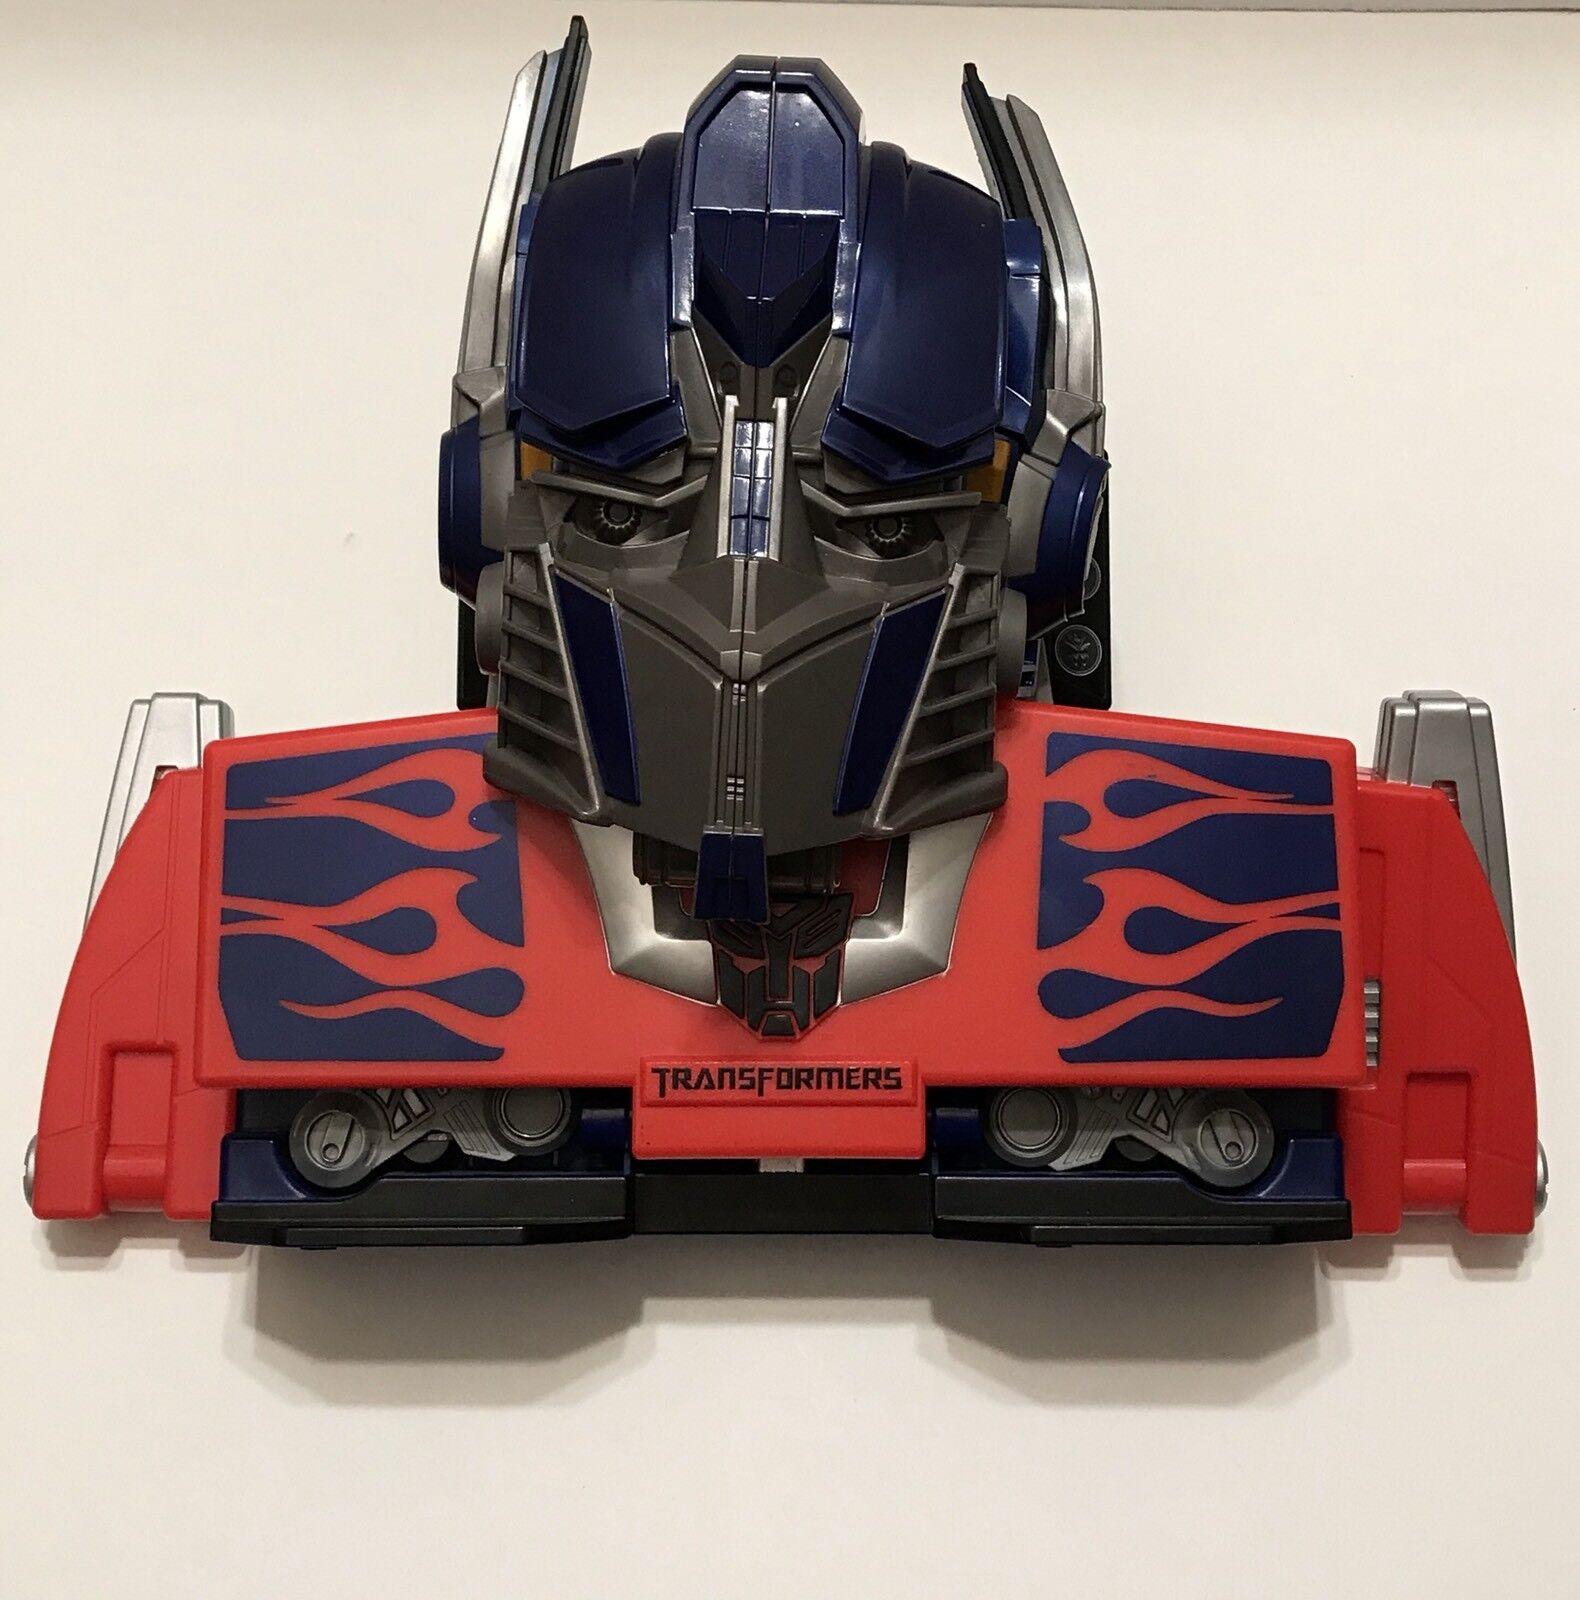 Transformers Optimus Prime Interactive Computer Game